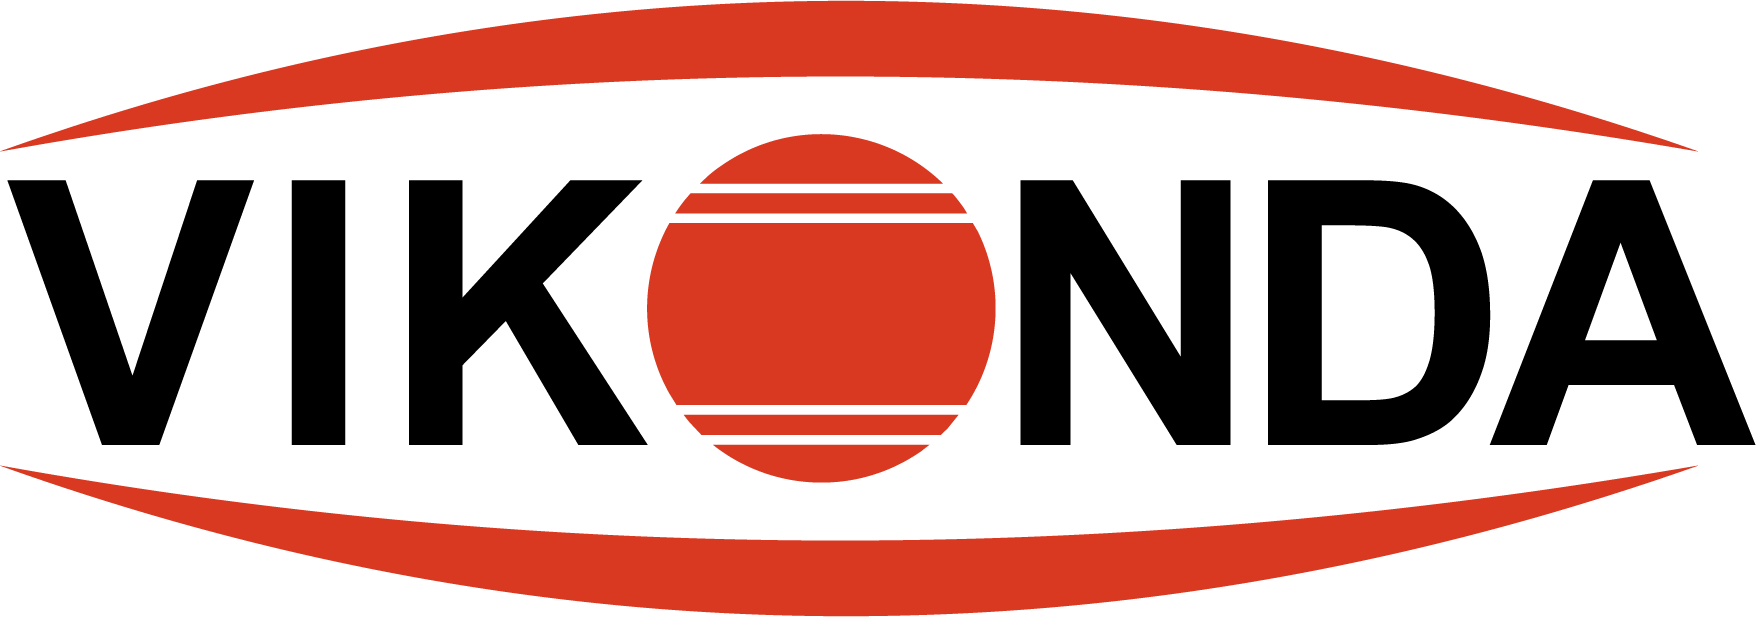 VIKONDA